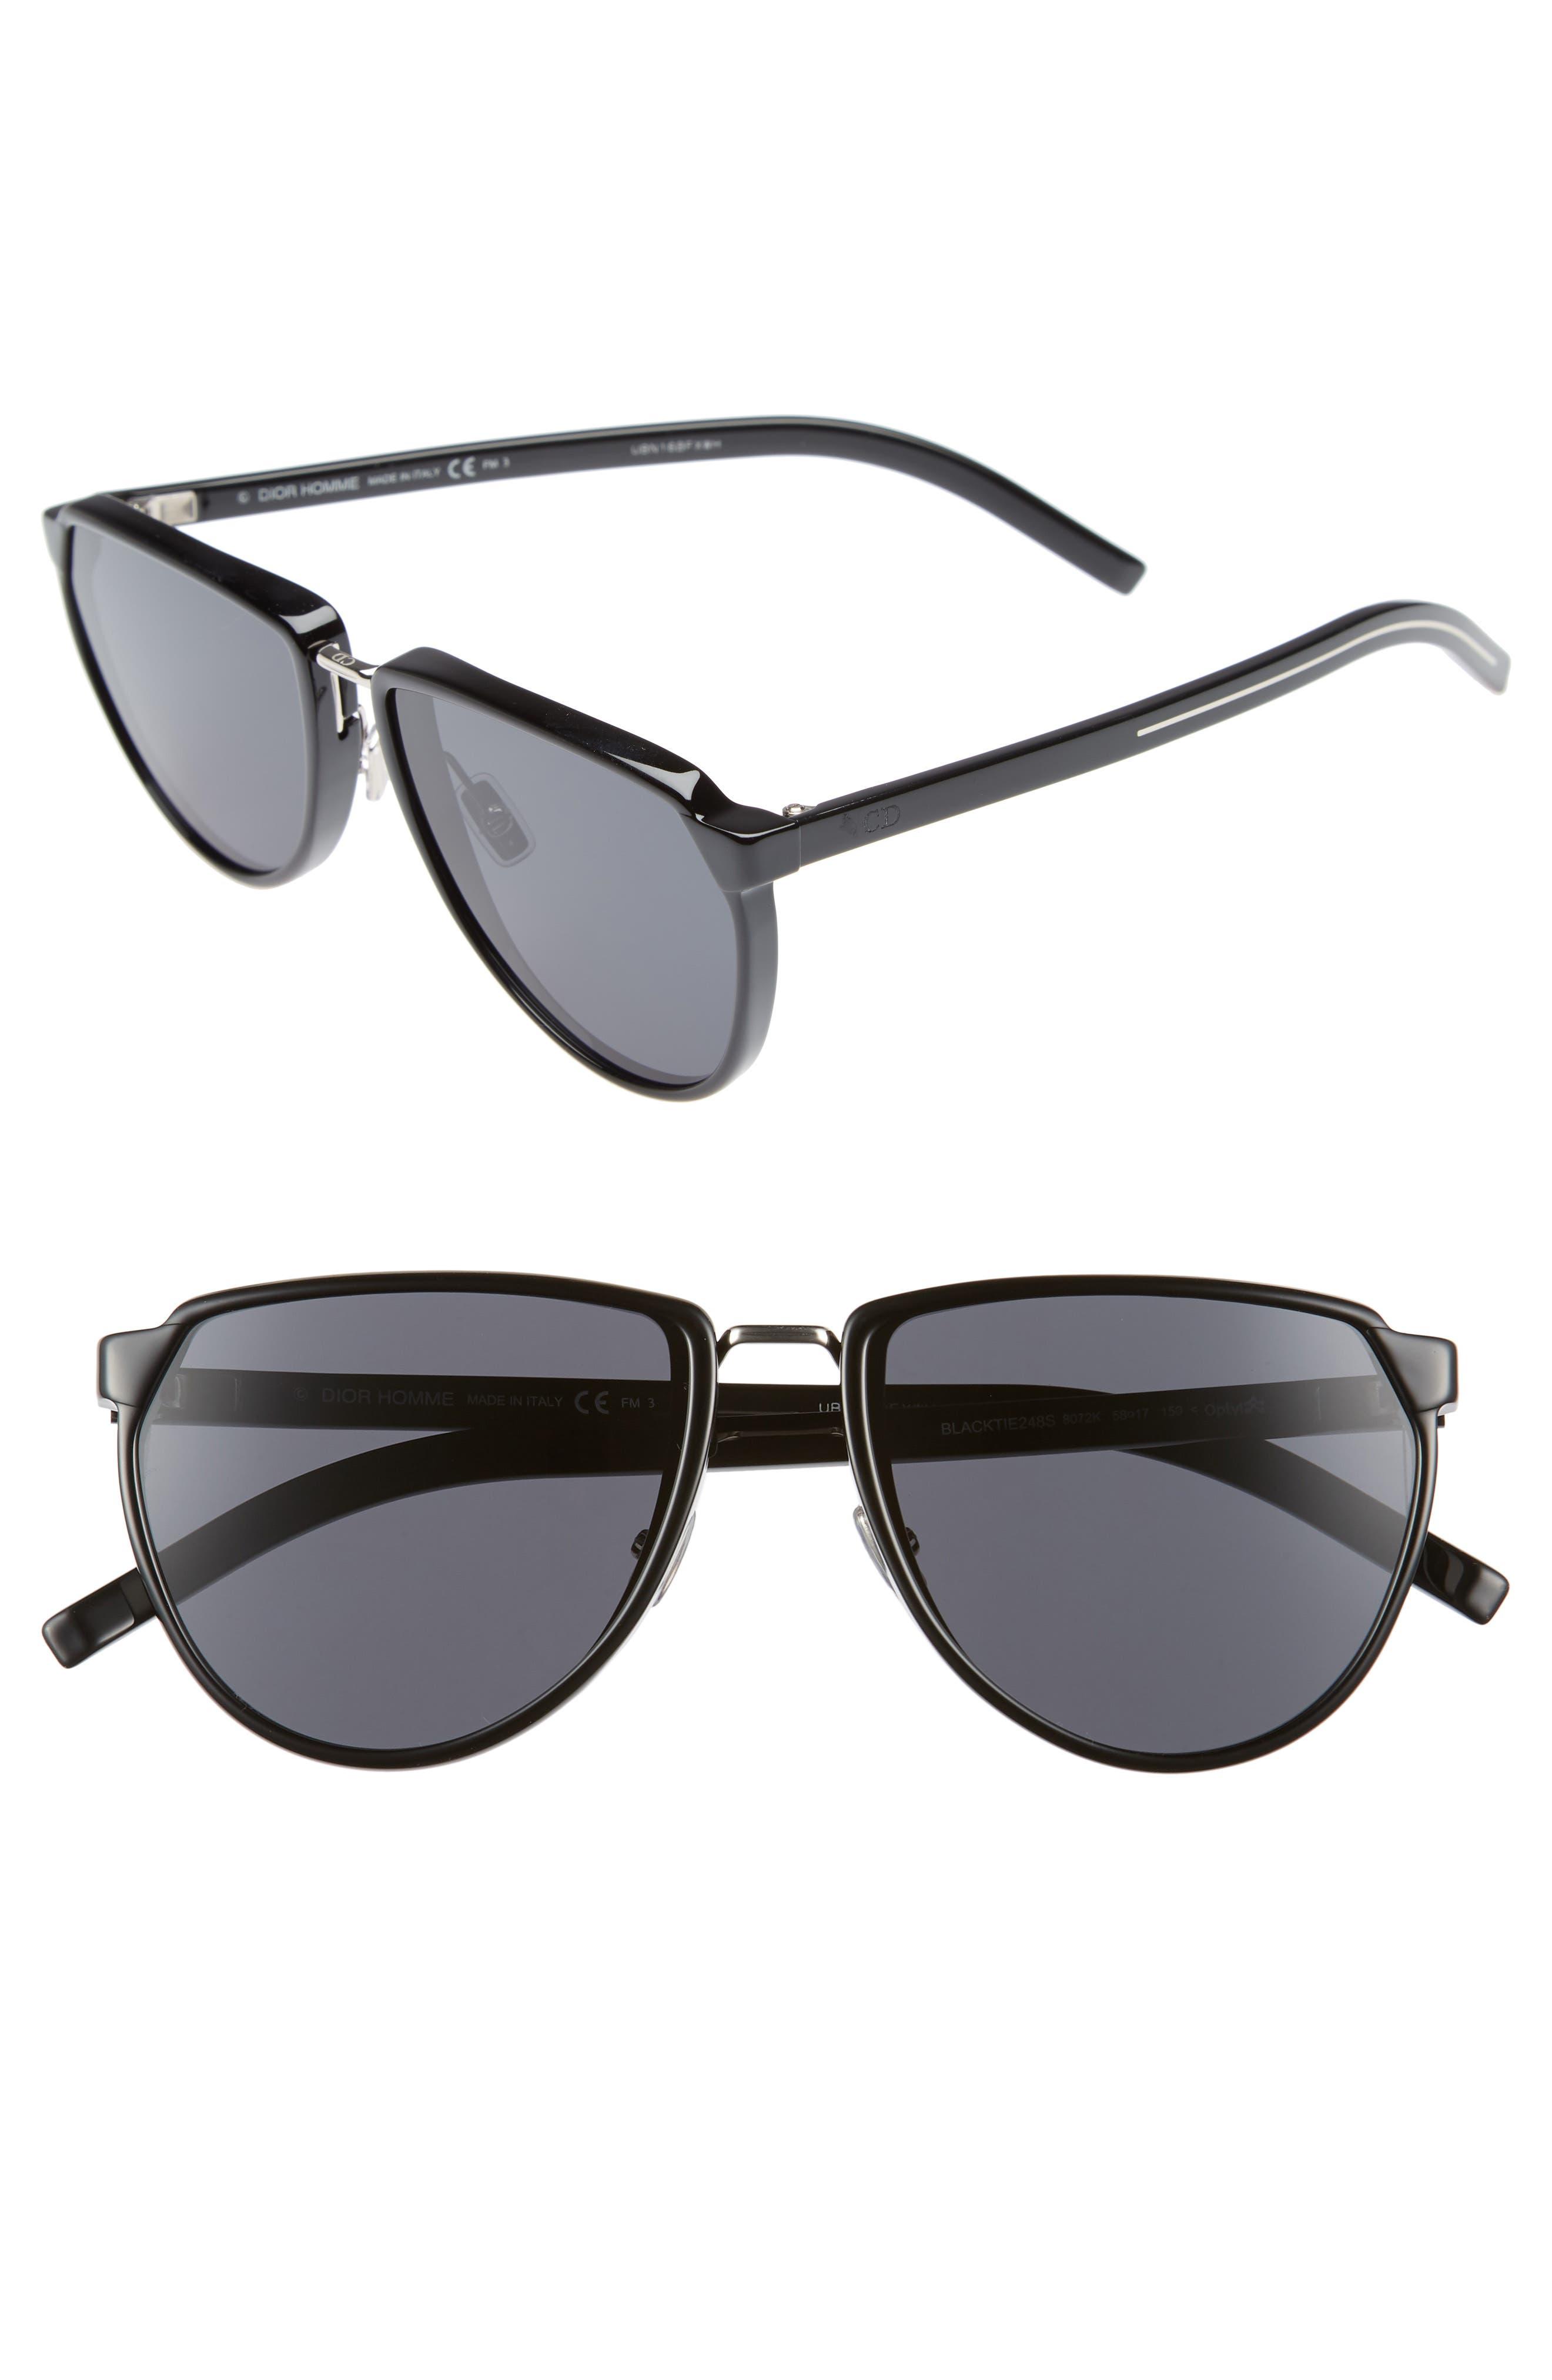 DIOR HOMME 58Mm Sunglasses - Black